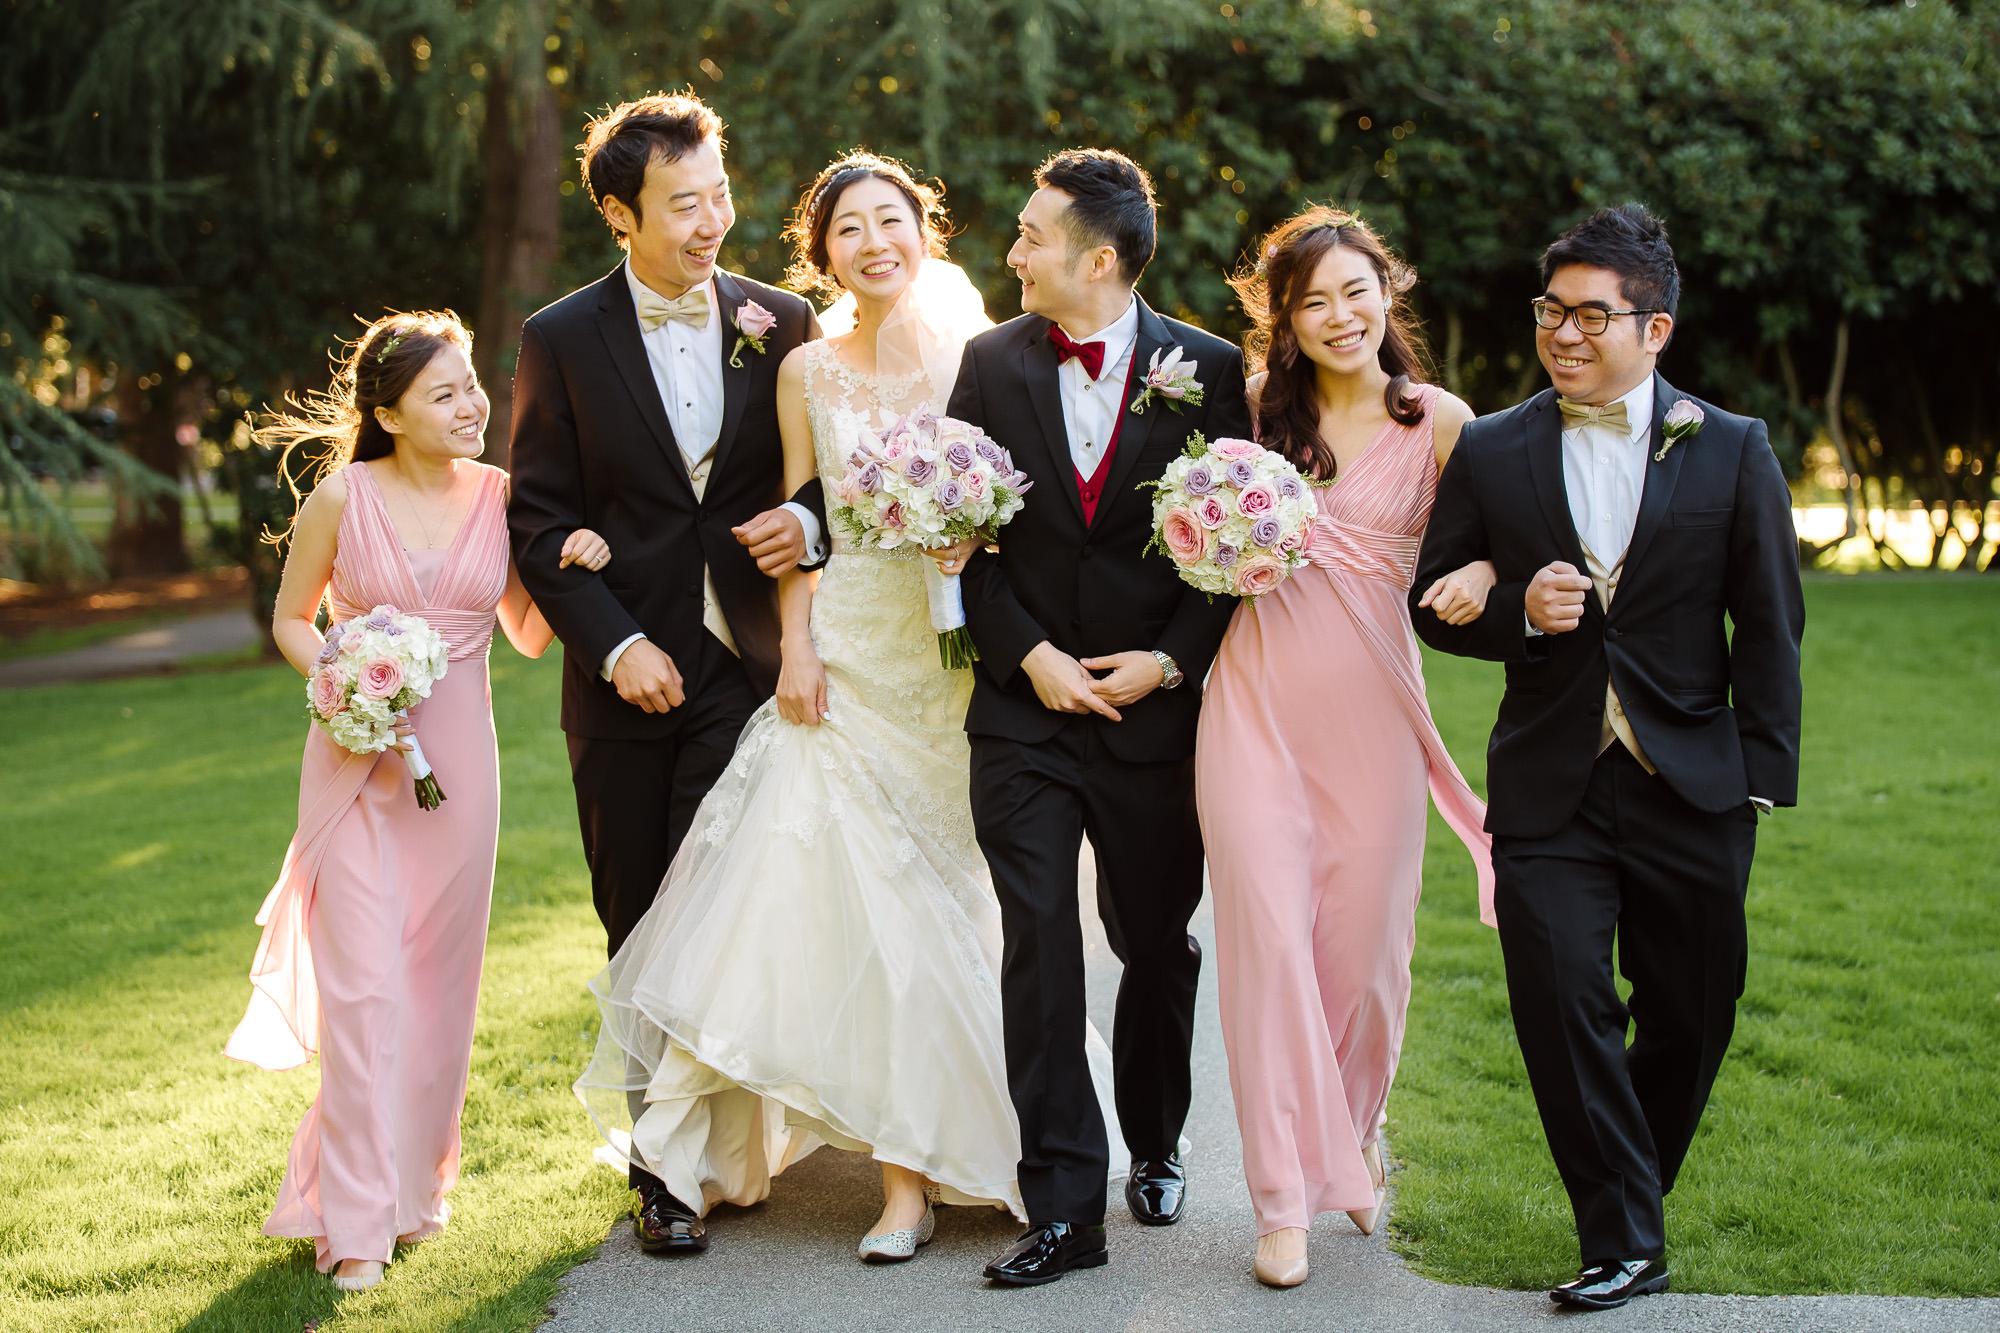 minoru_chapel_richmond_wedding_ceremony 17064520.jpg